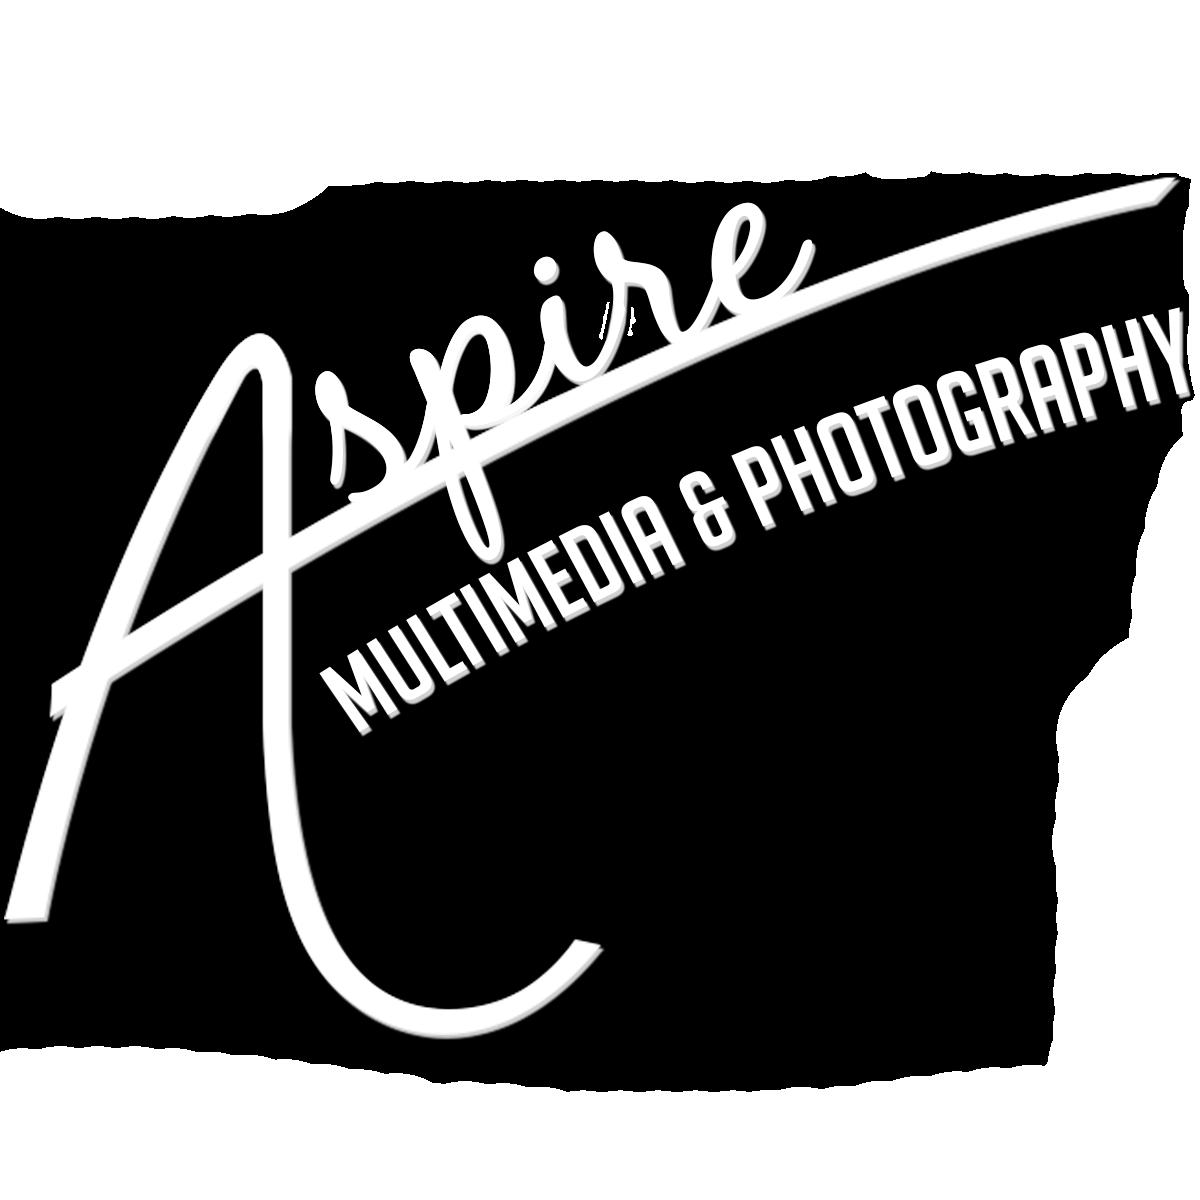 Aspire Multimedia & Photography Orlando, FL